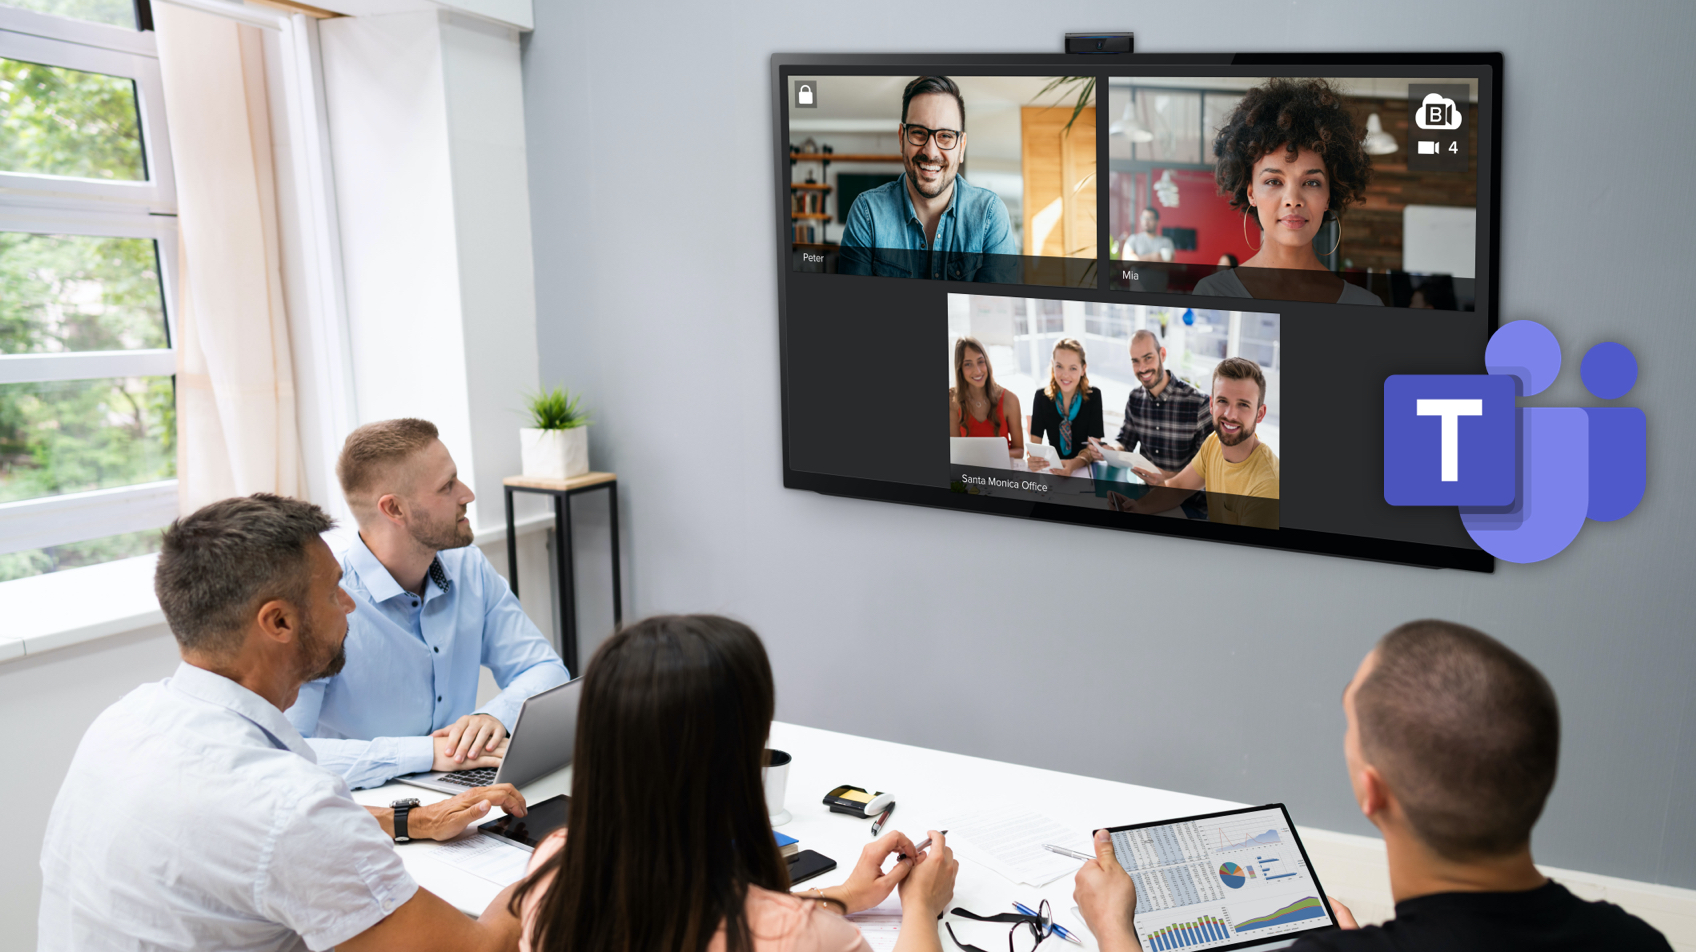 Cloud Video Interop for Microsoft Teams